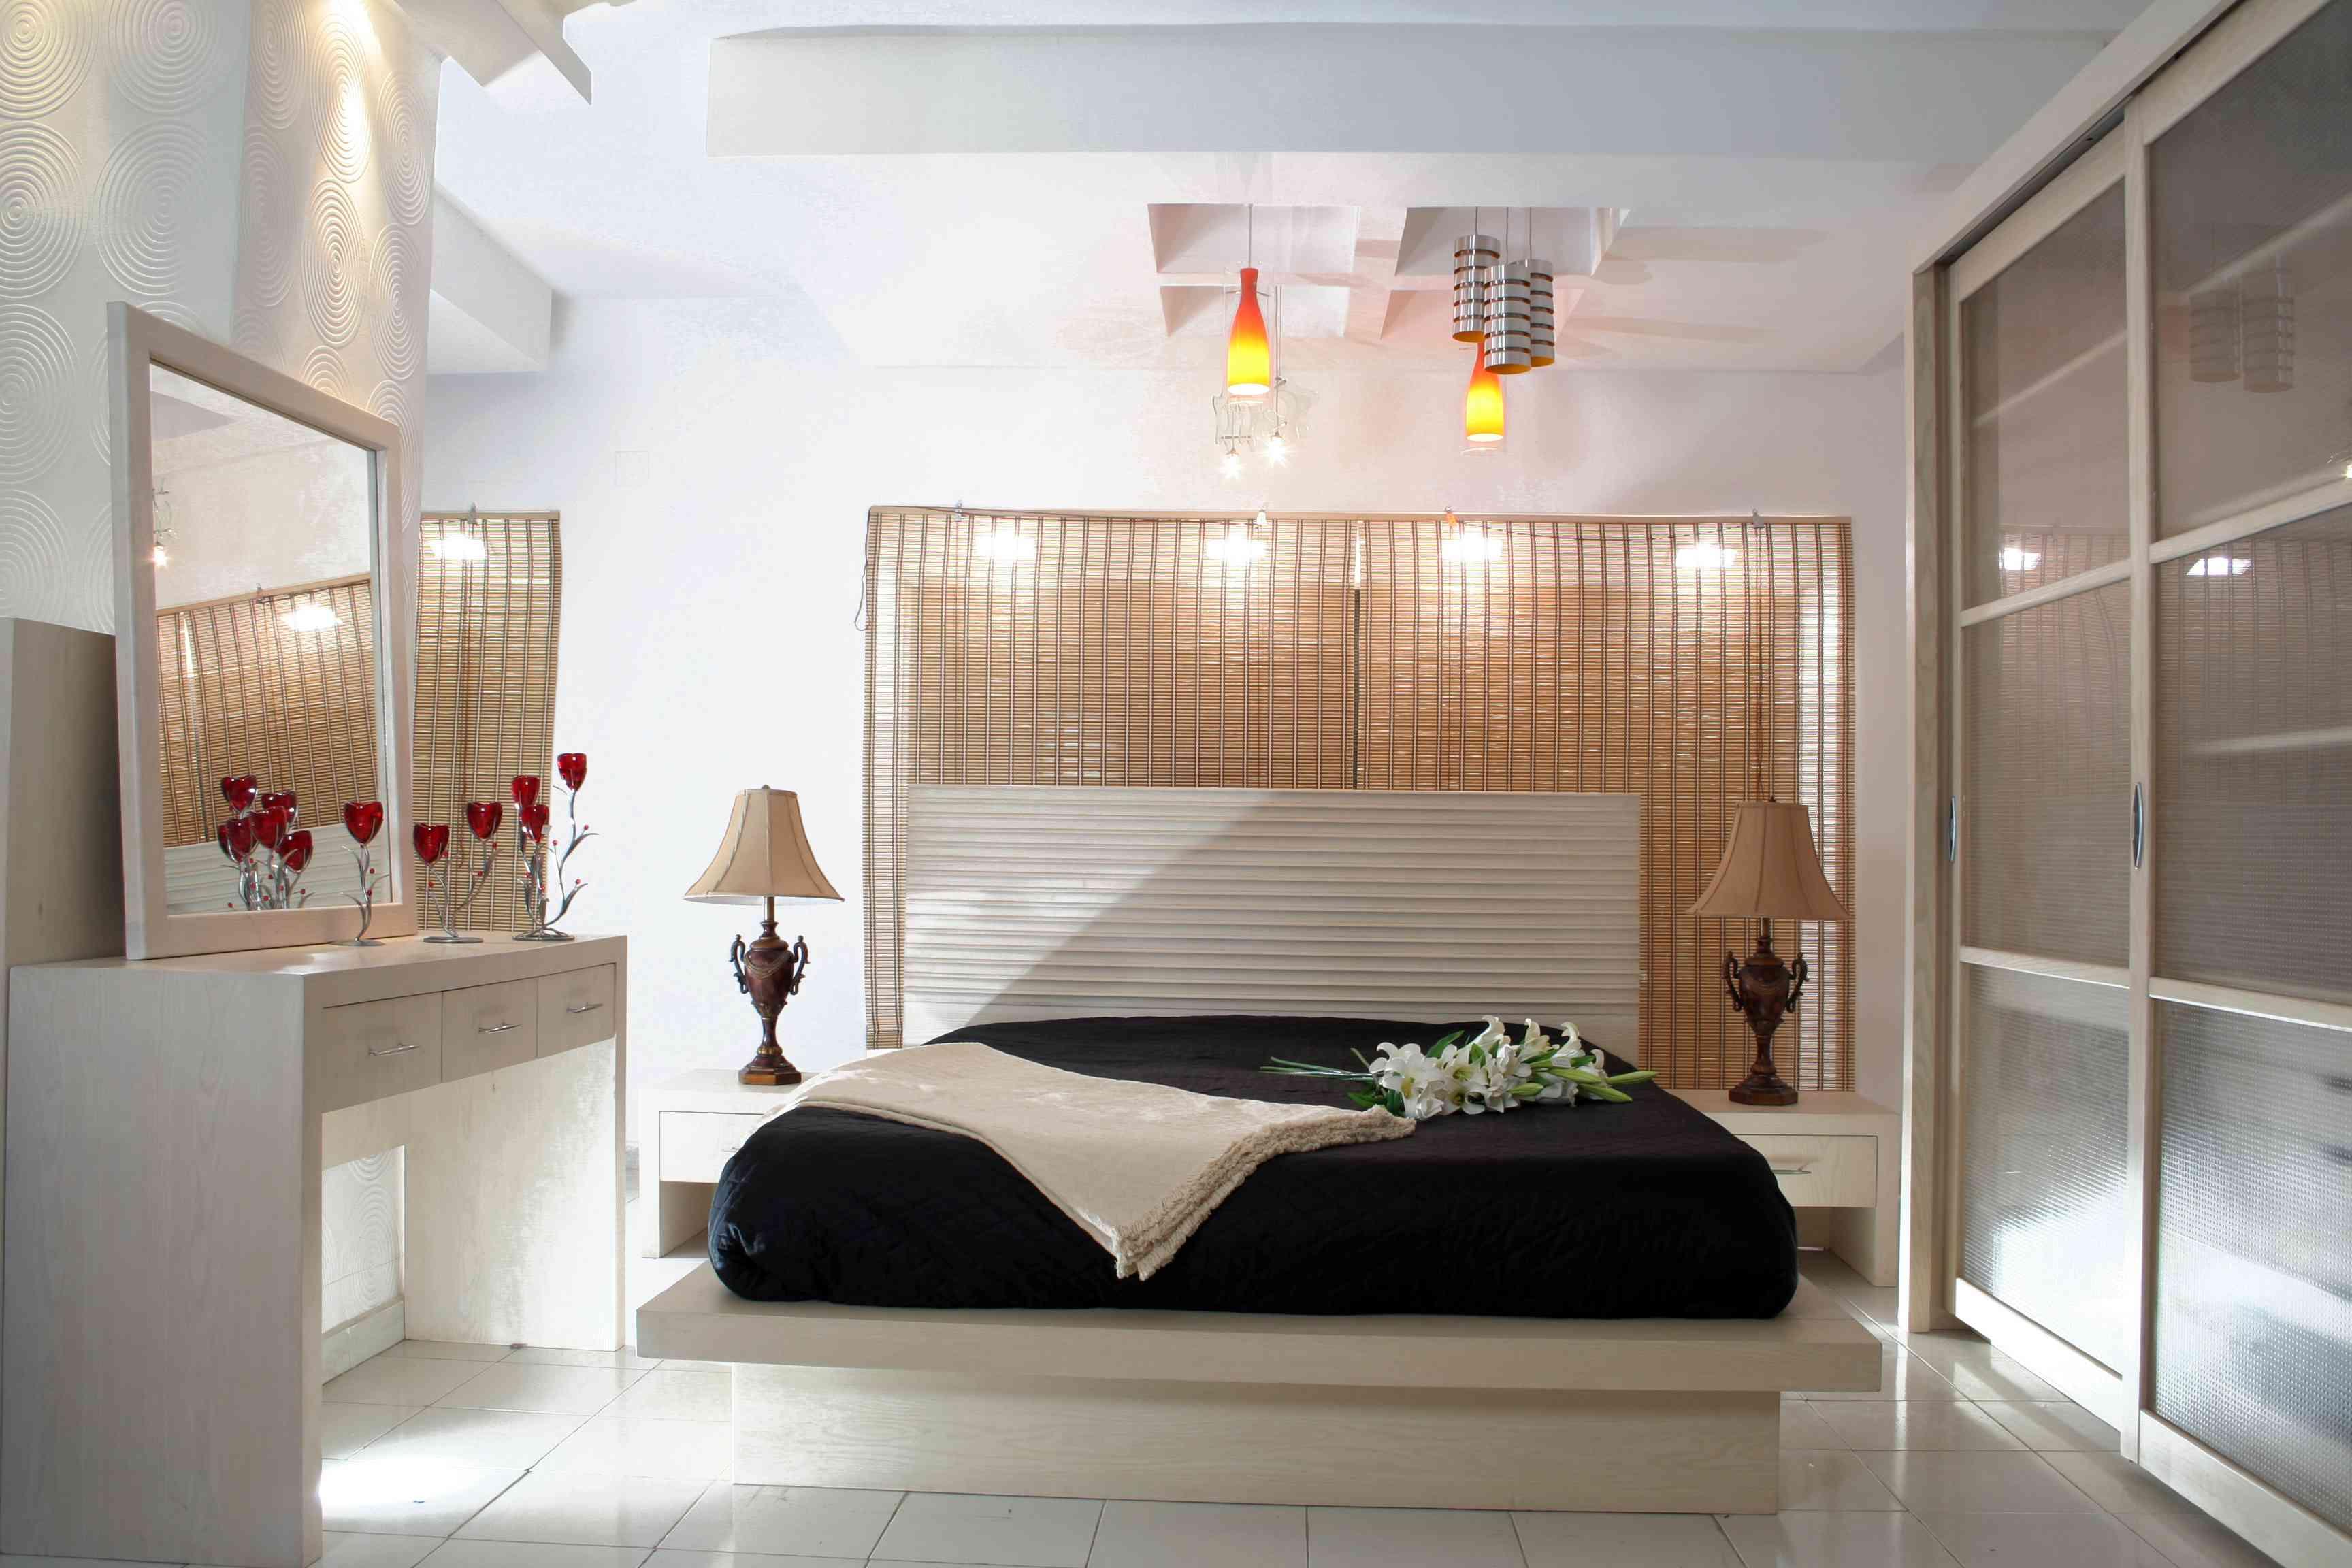 May 27 2020 explore vishwkarma vanshi s board double bed designs on pinterest. تصاميم غرف نوم متزوجين   المرسال